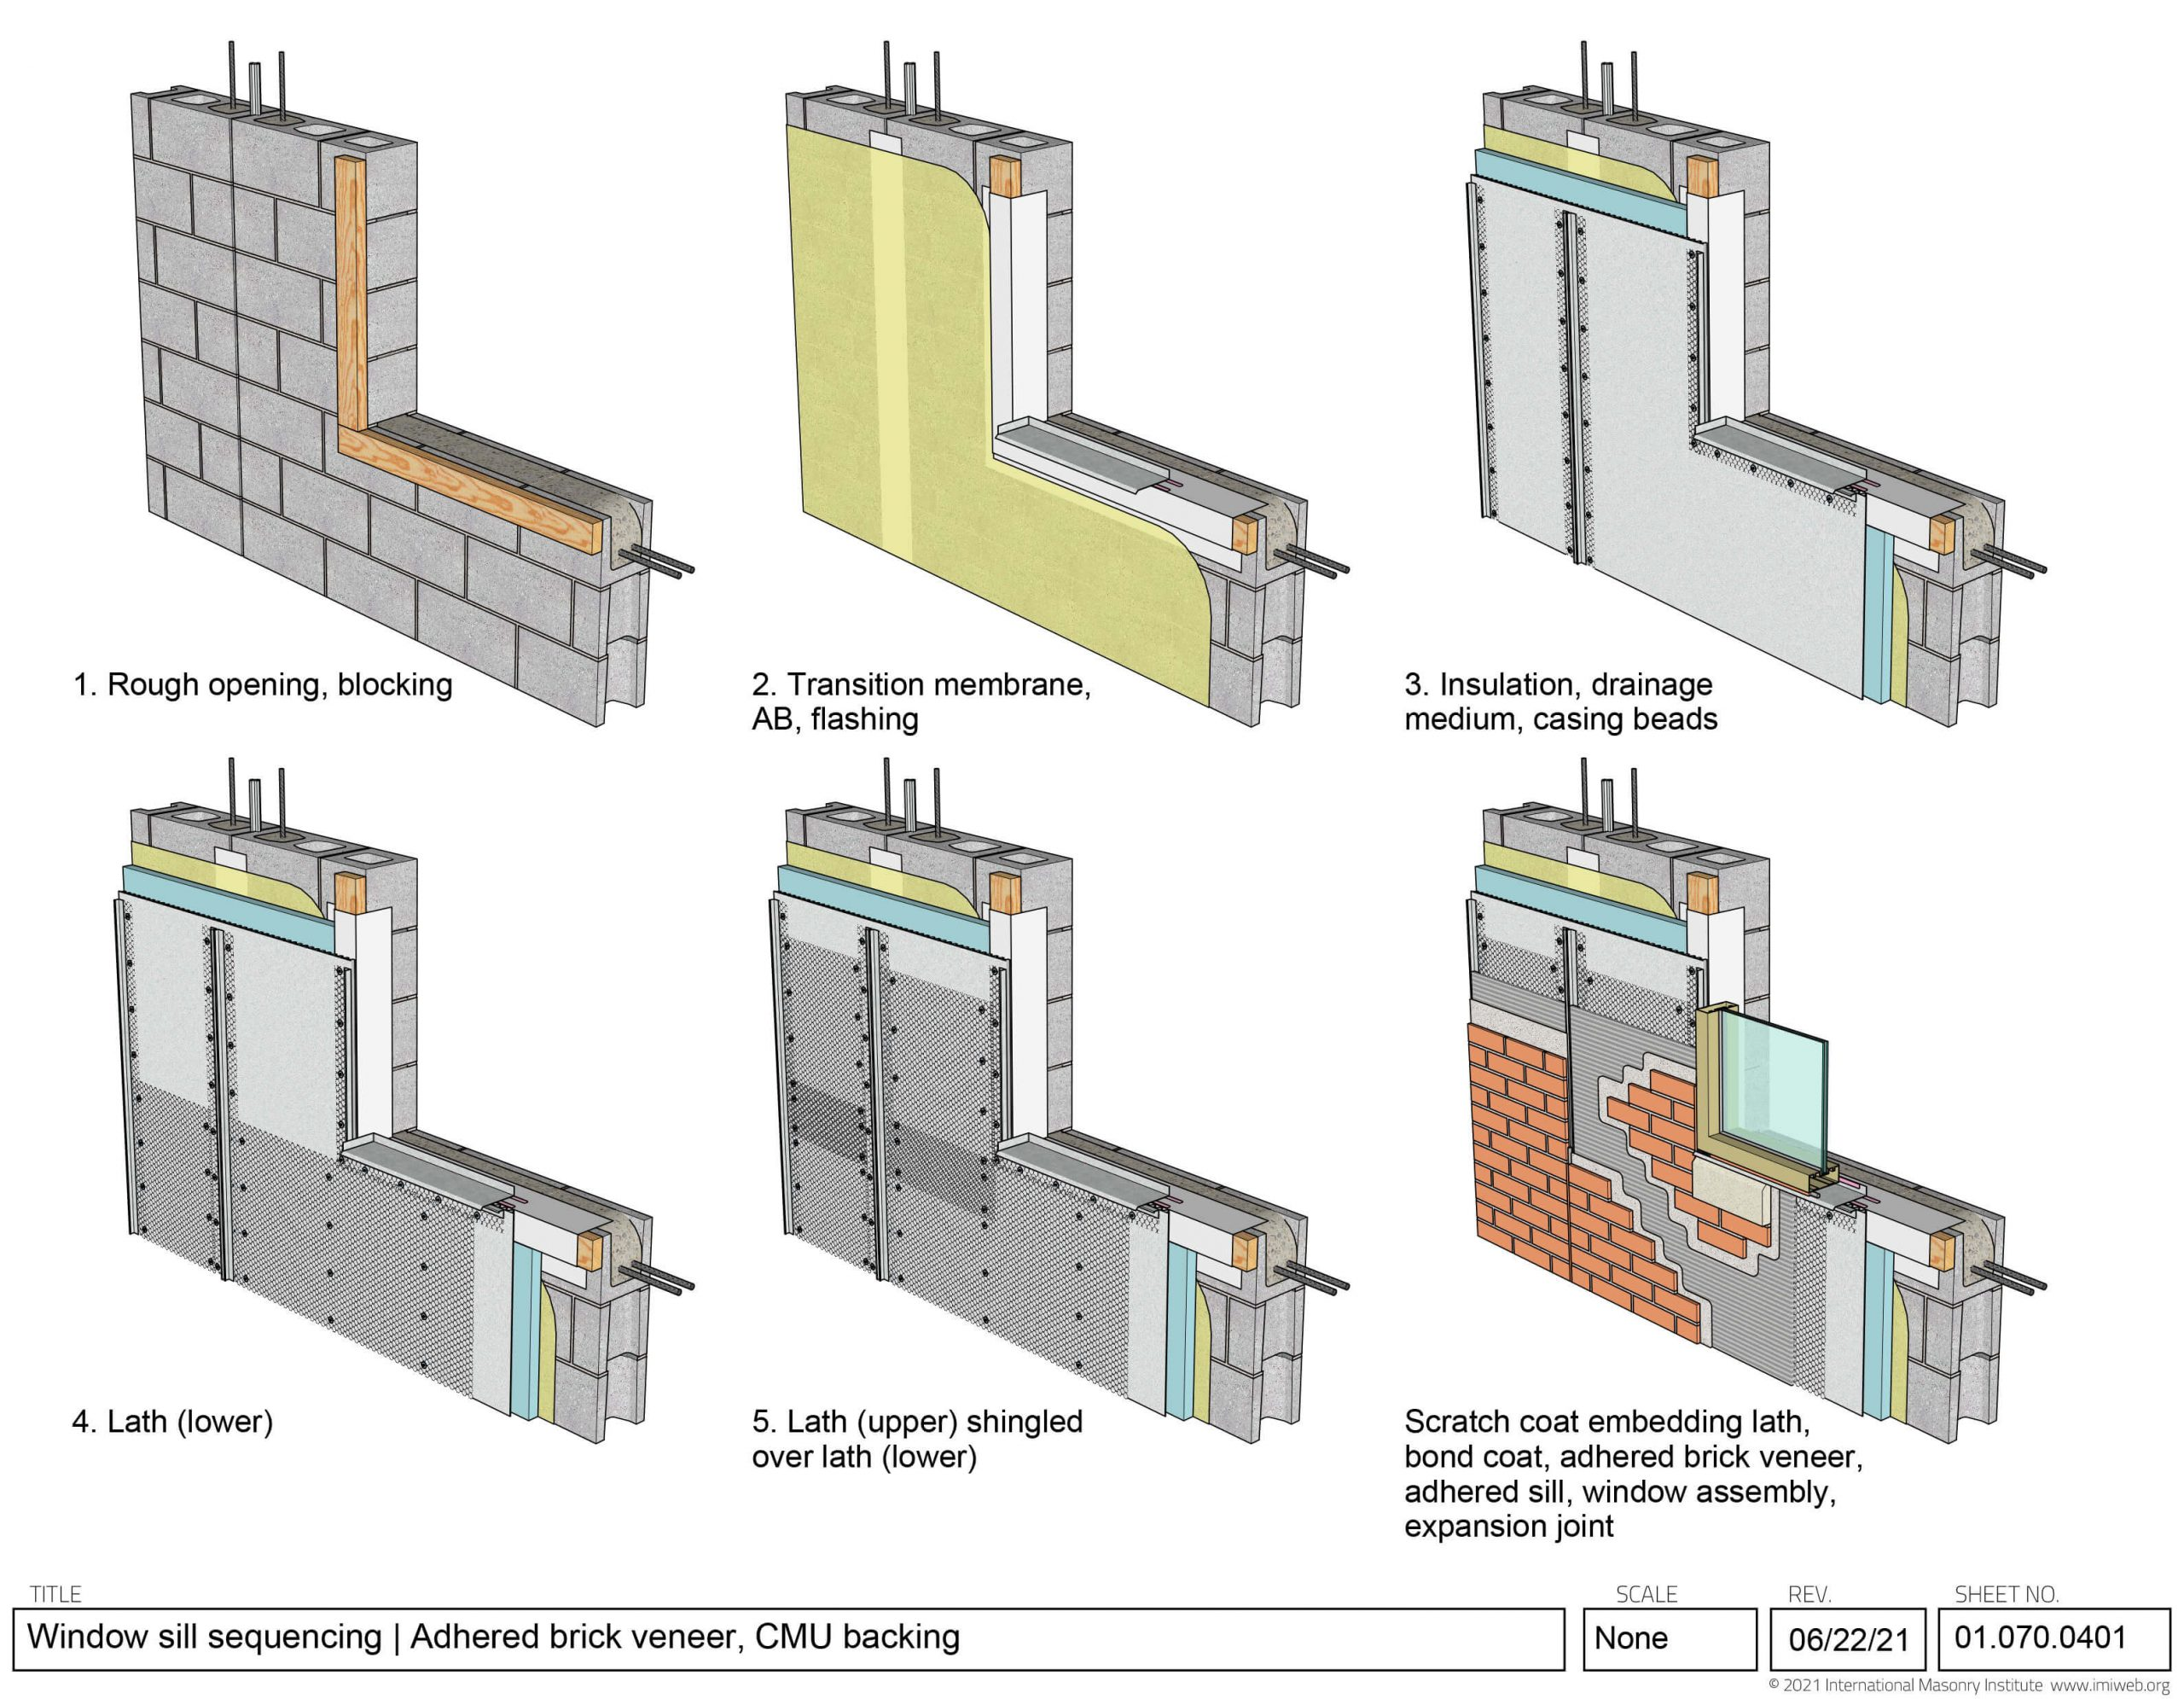 Adhered brick veneer window sill with CMU backing installation steps